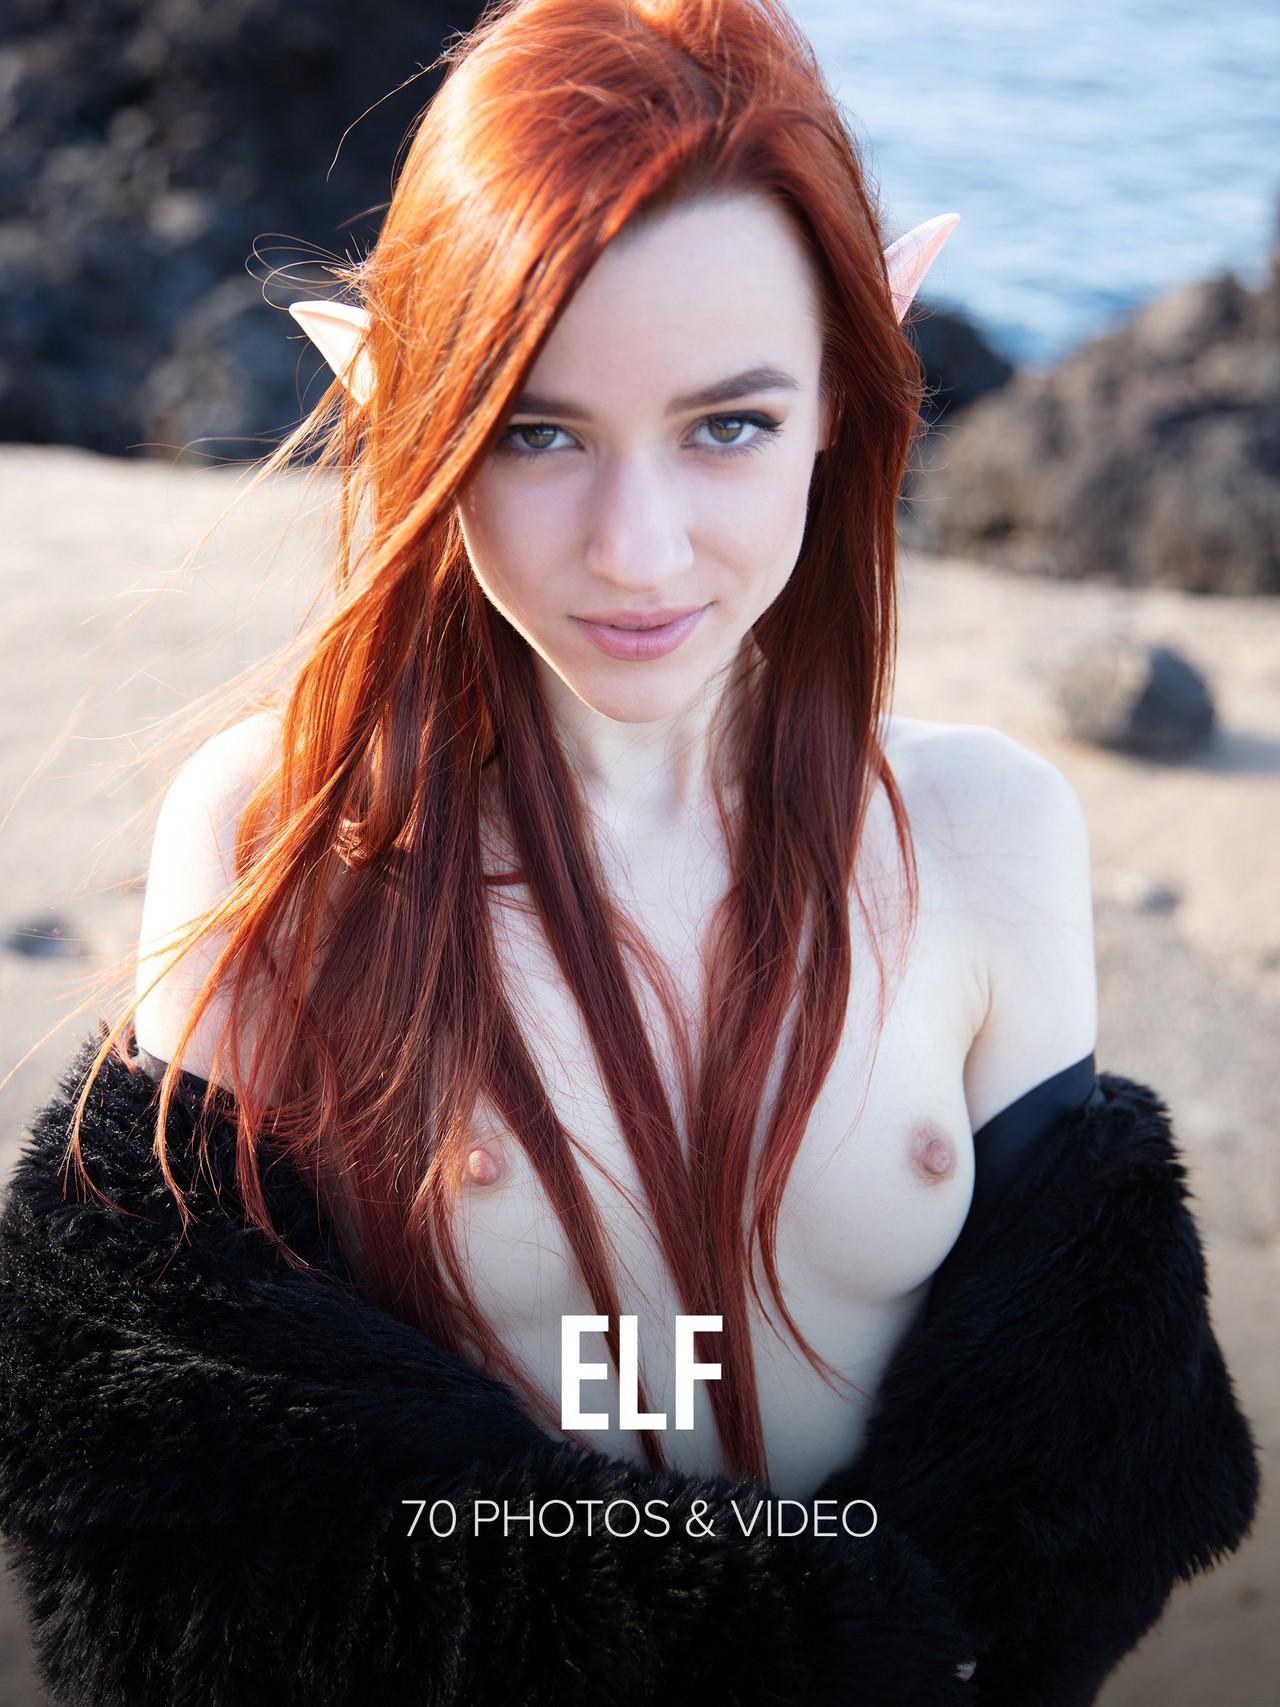 Sherice: Elf